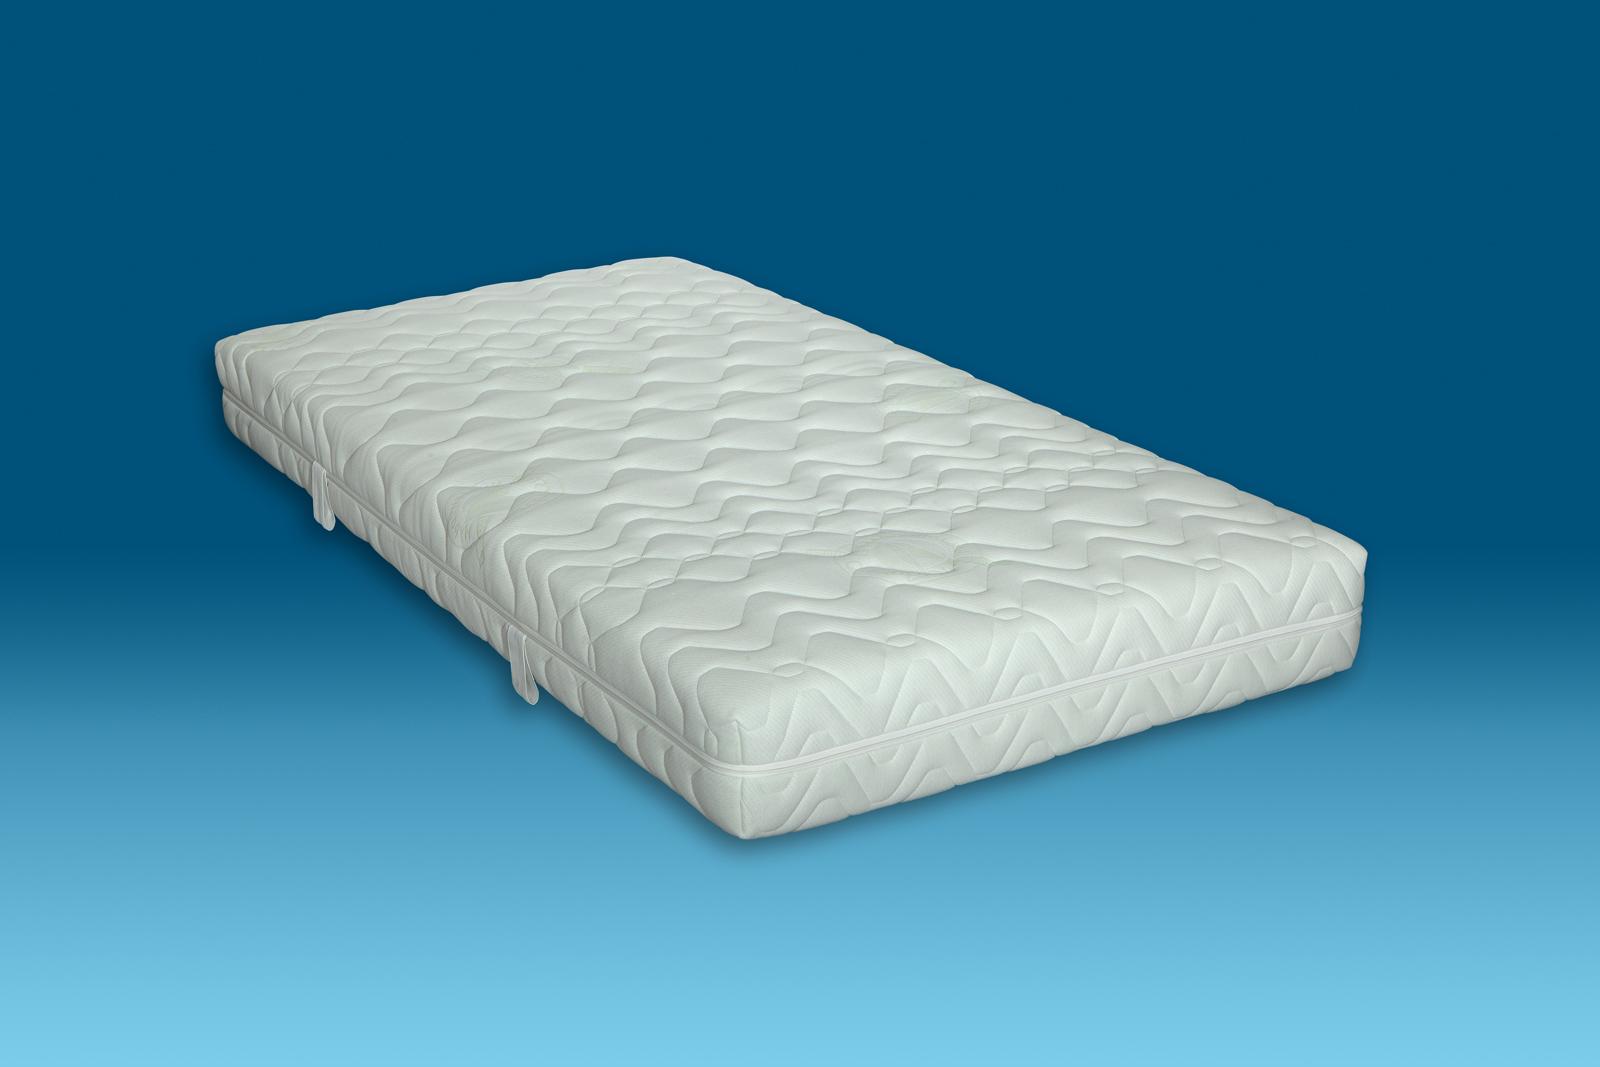 malie matratzen 140x200 polar tfk h3 greenfirst 5 zonen. Black Bedroom Furniture Sets. Home Design Ideas